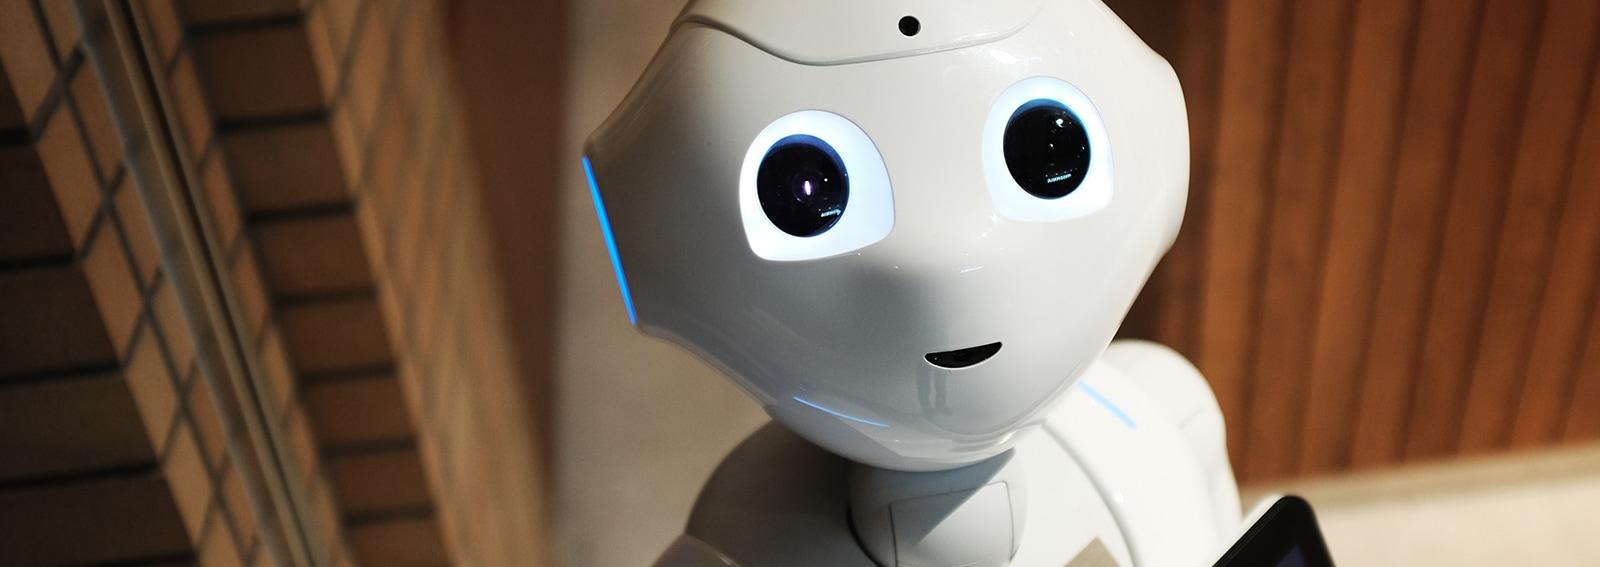 alex-knight-robot-unsplash